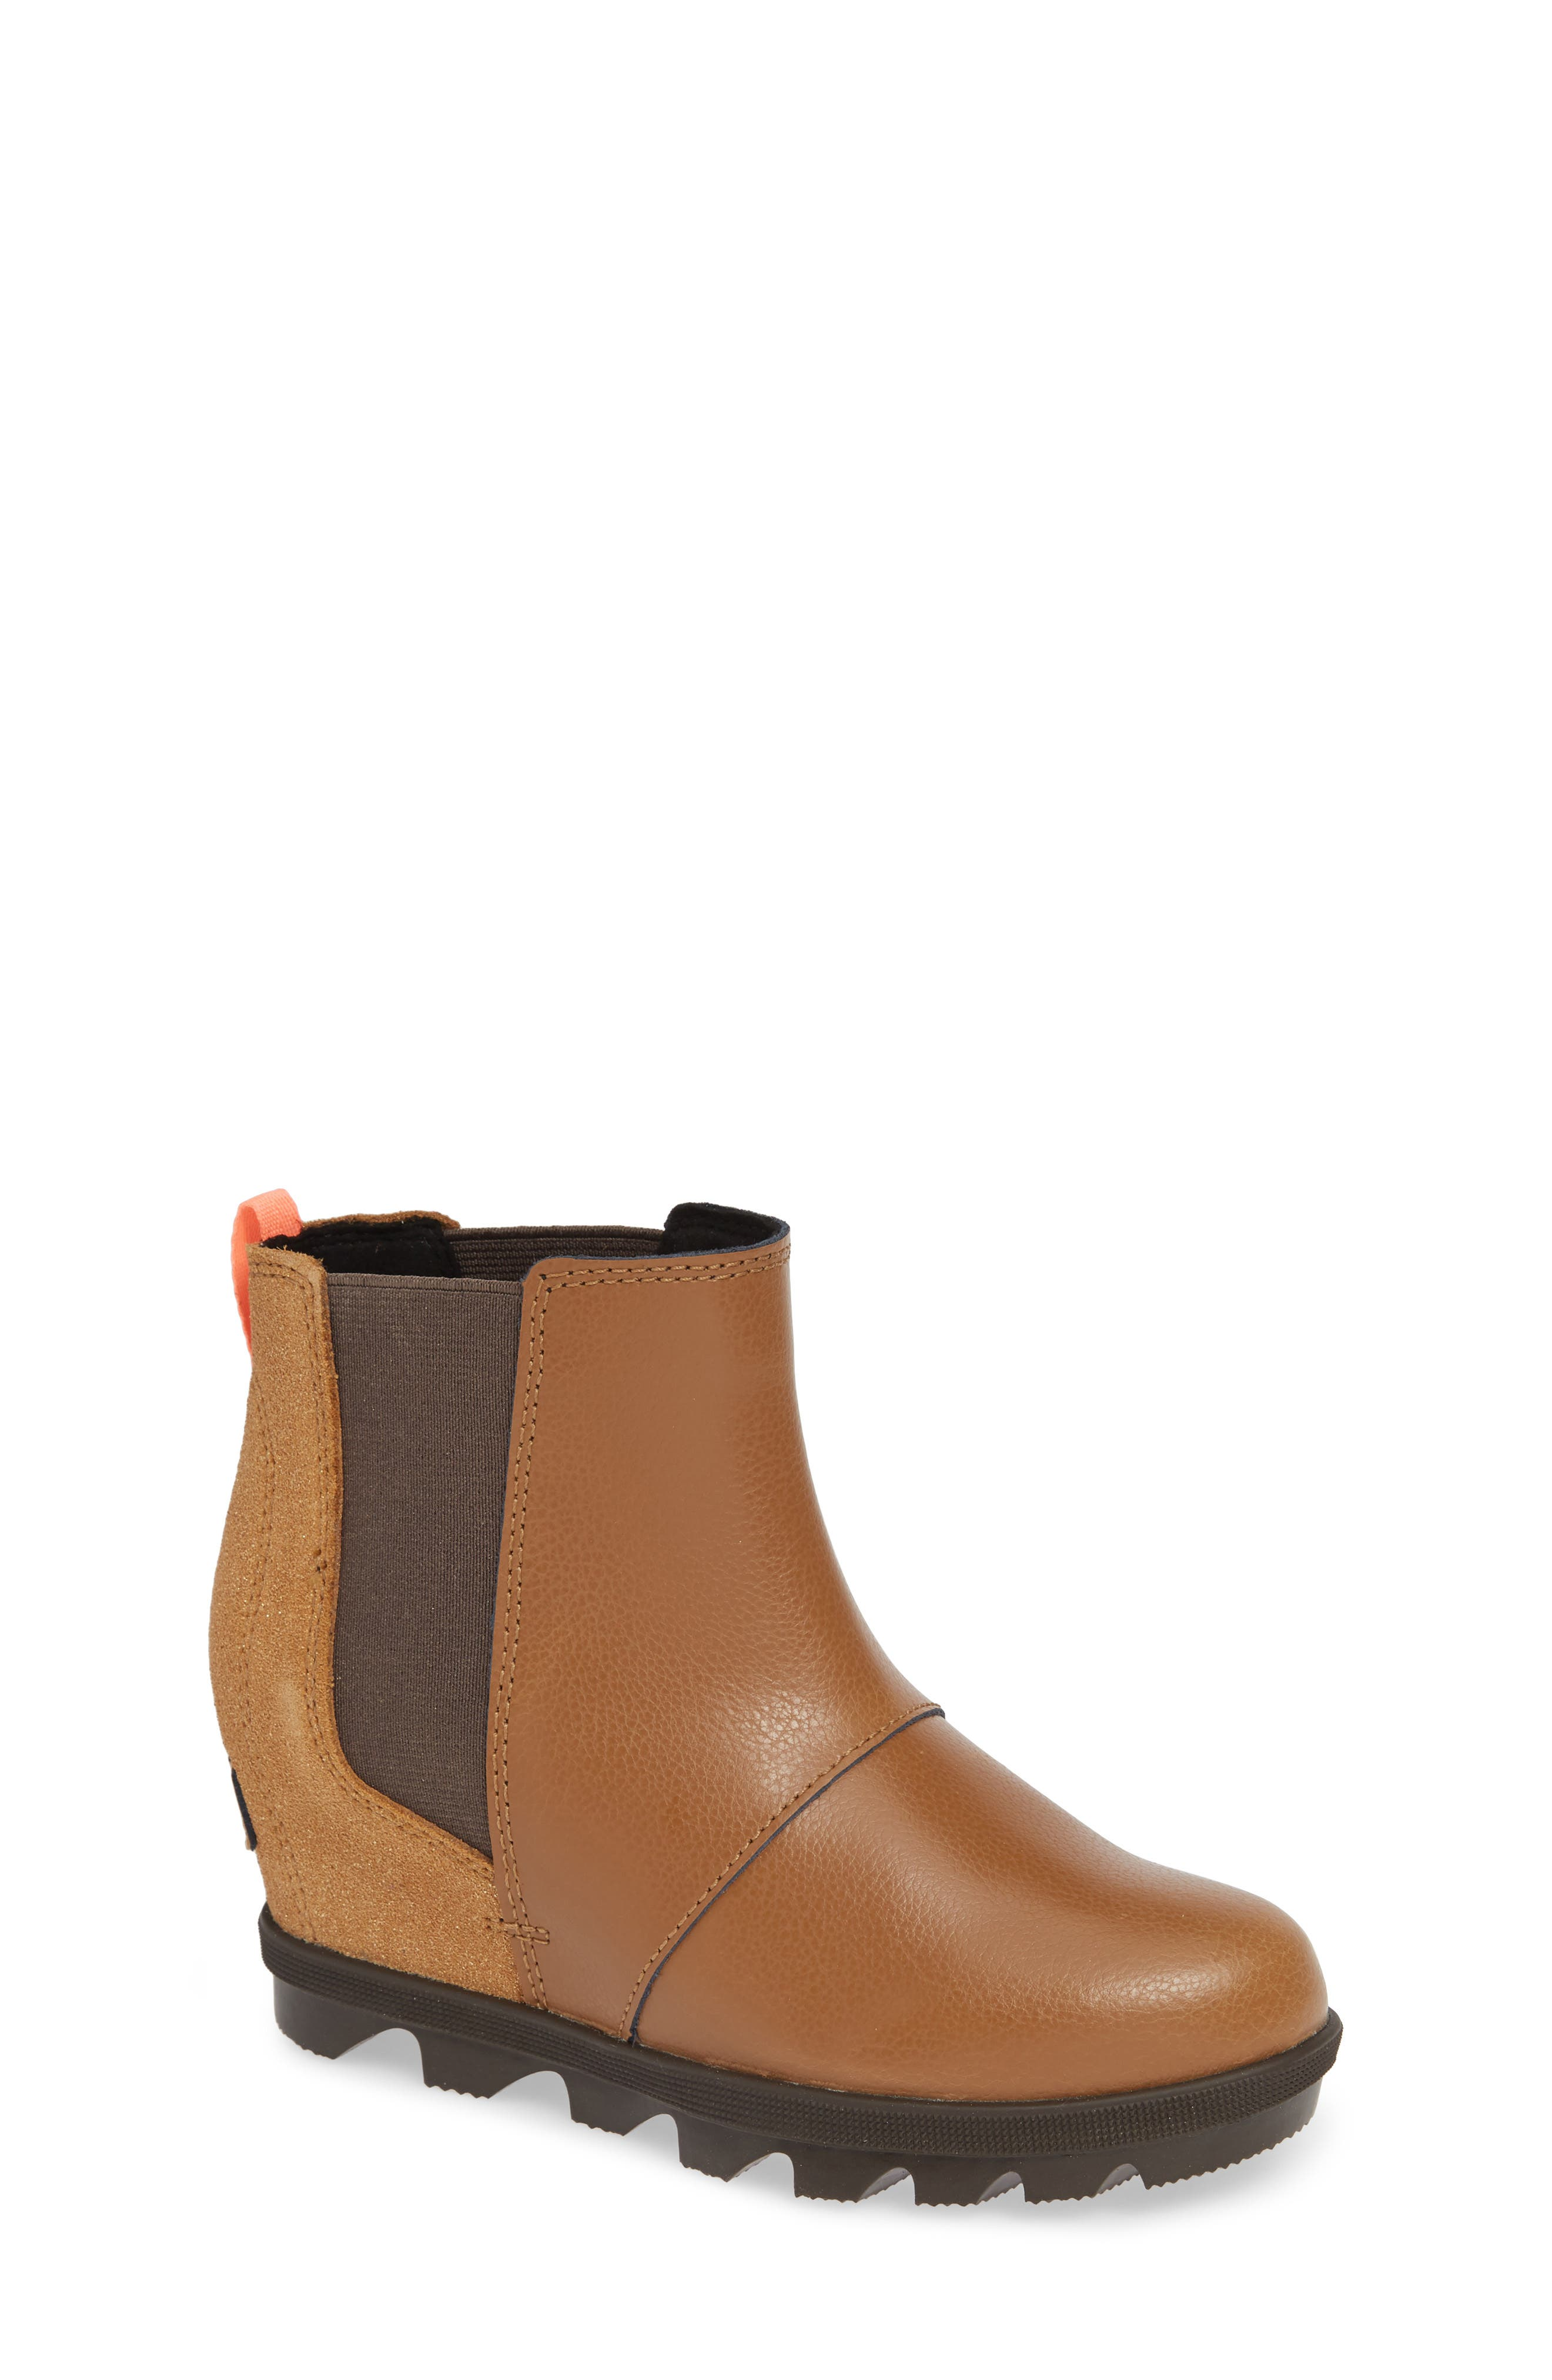 f1624ca61300 Girl s Sorel Joan Of Arc Ii Waterproof Wedge Chelsea Boot